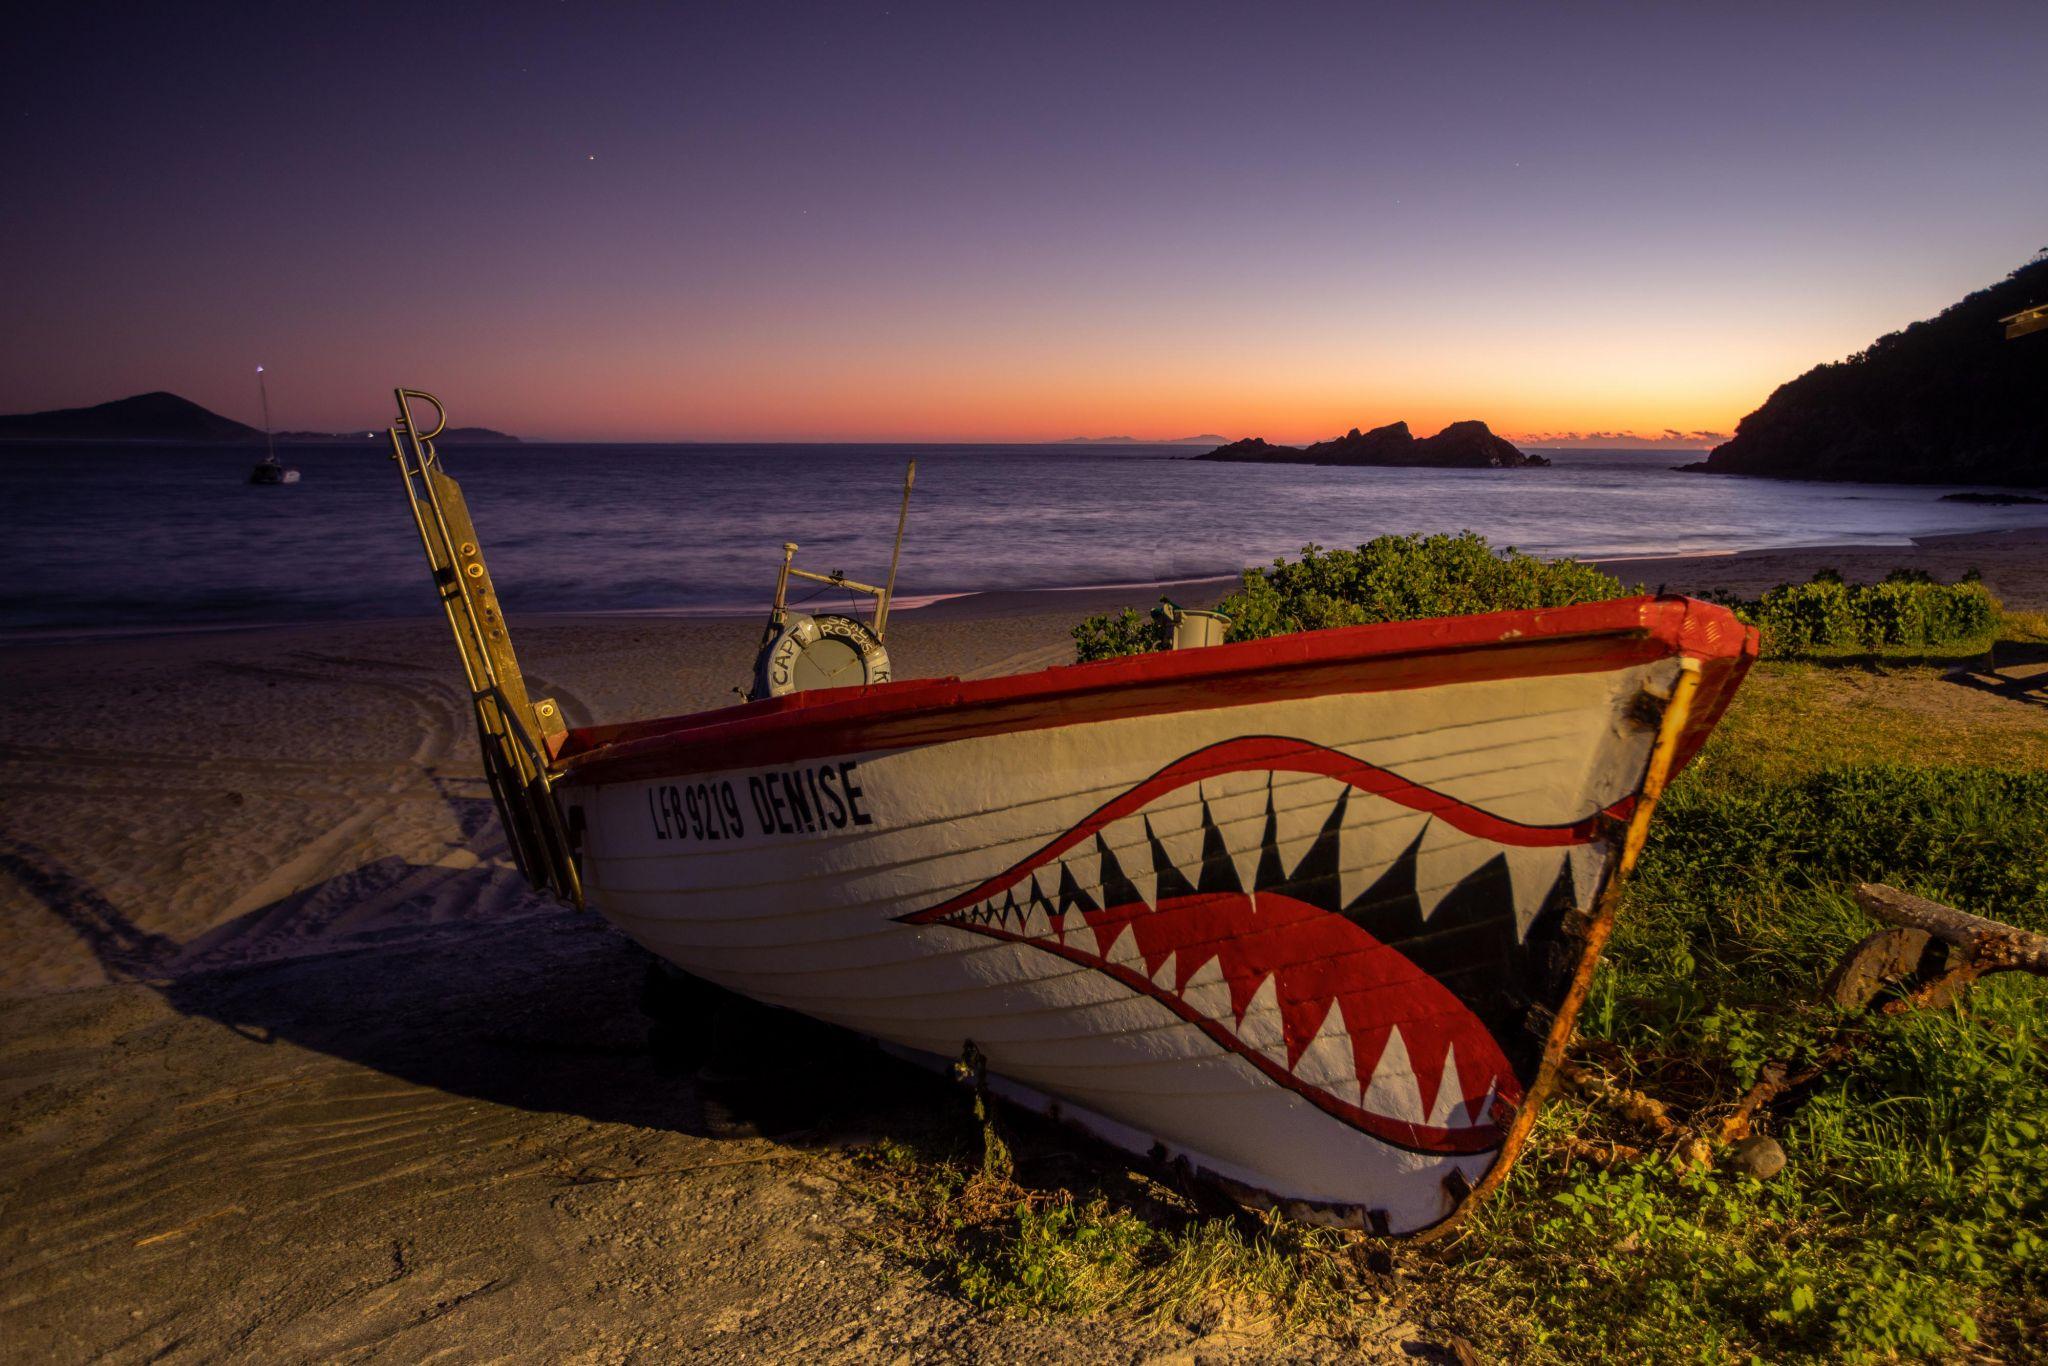 Fishing Boat Sugar Loaf Bay, Seal Rocks sunrise, Australia